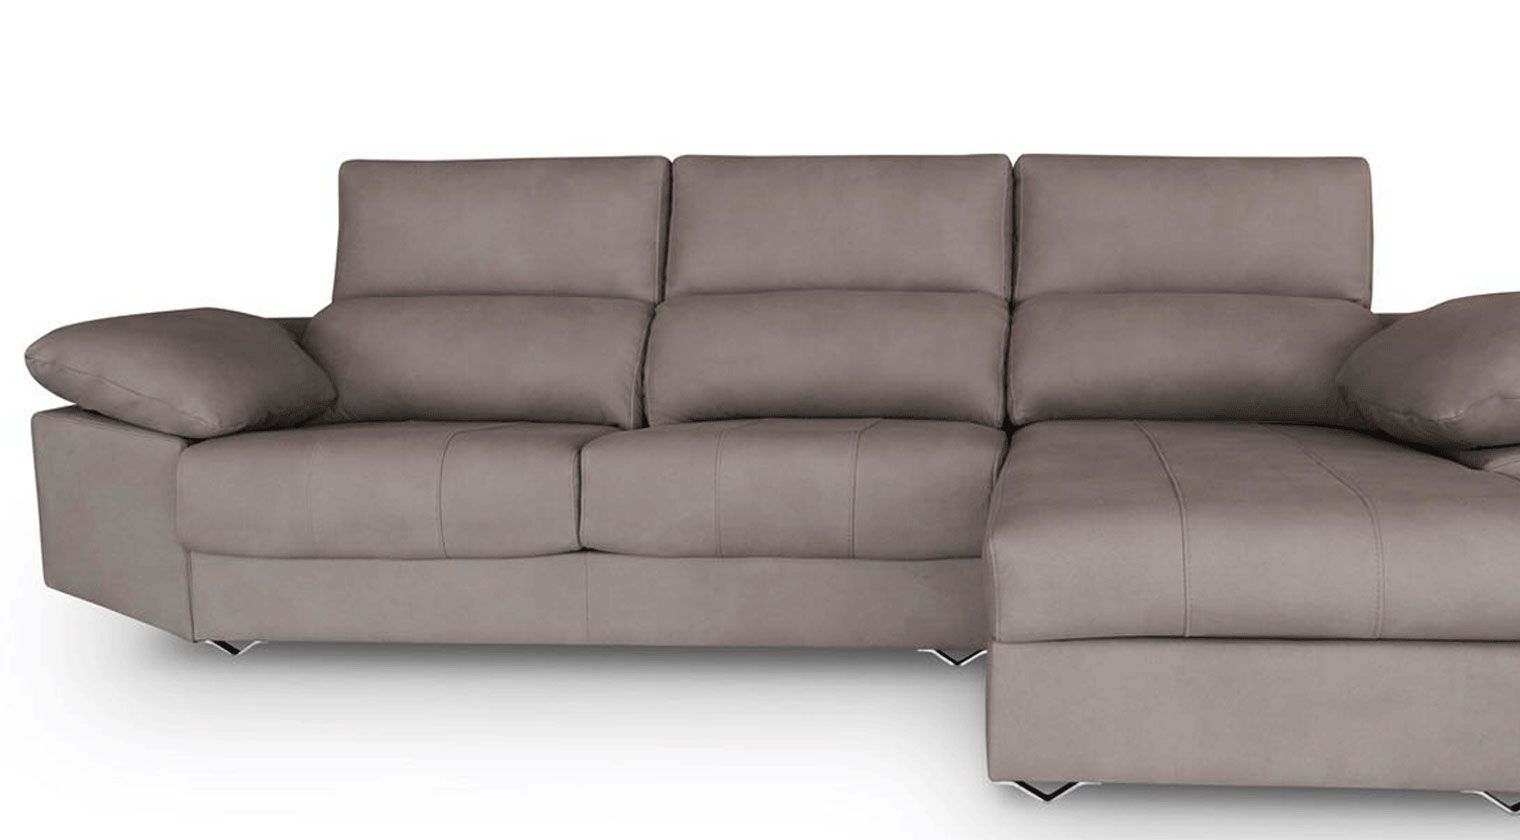 Sof tela invictus chaise longue tela - Telas tapiceria sofas ...